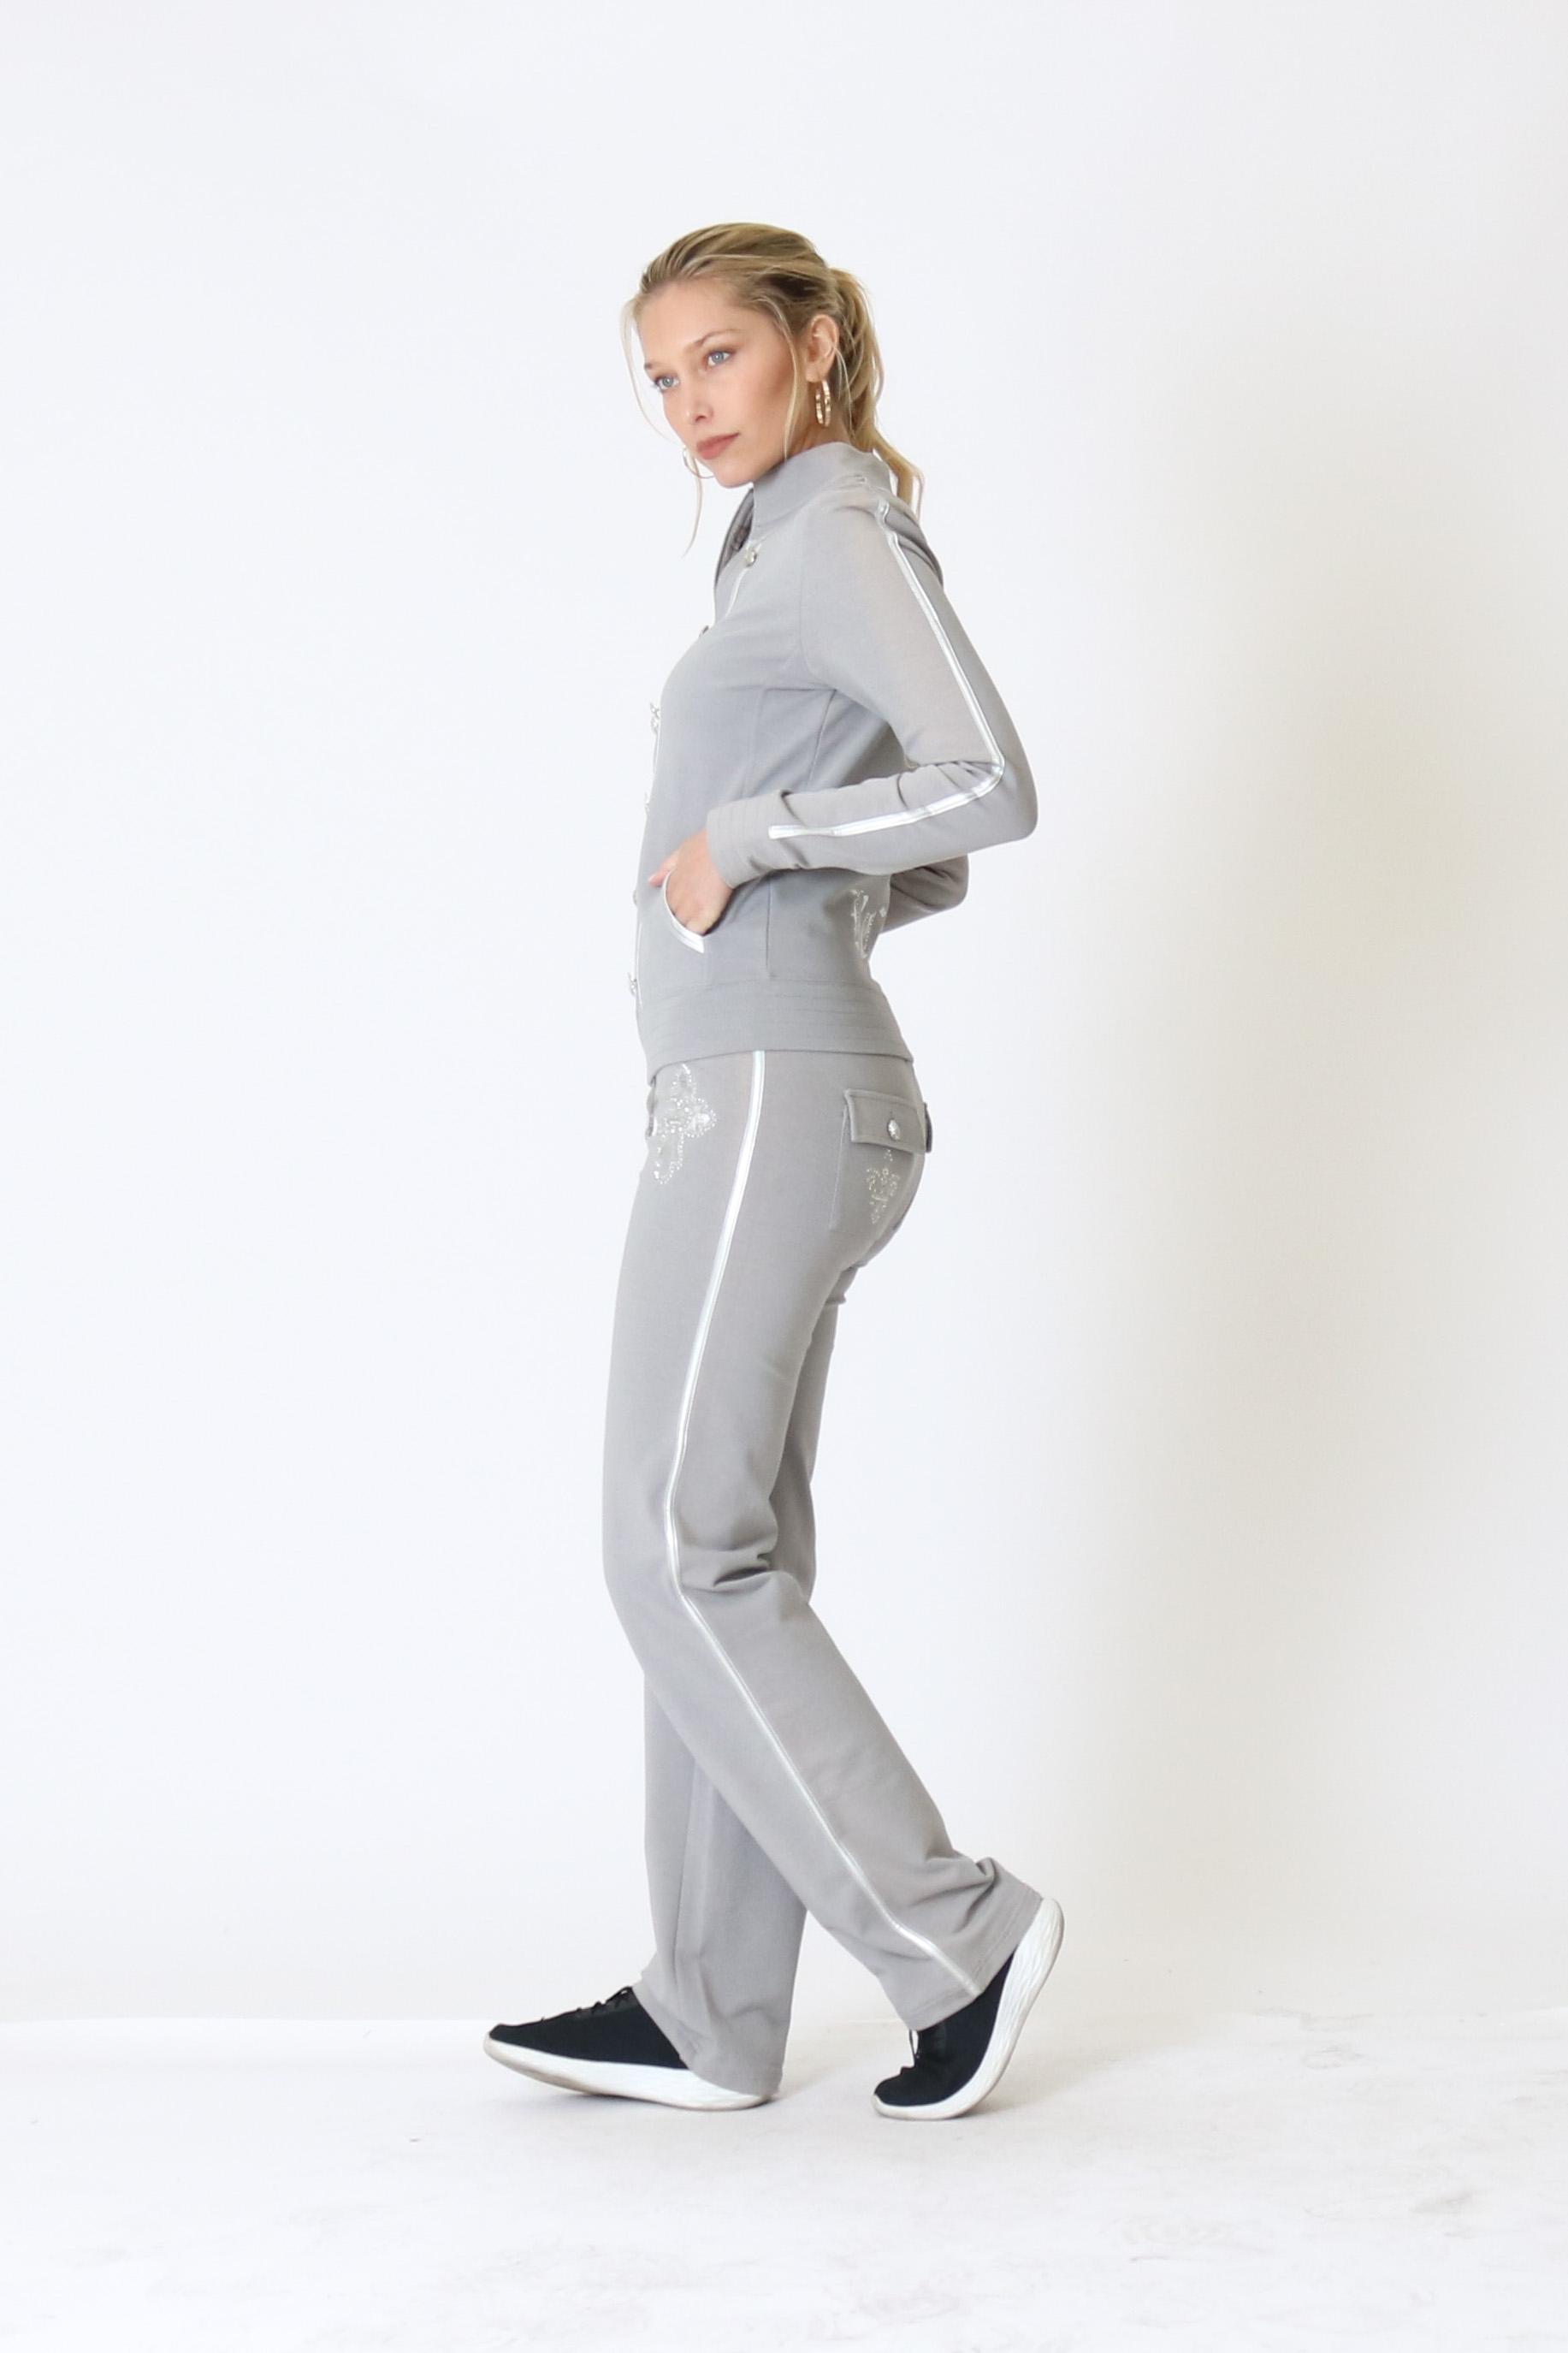 BCBG-Women-039-s-Lounge-Wear-2-Piece-Embellished-Jacket-and-Pants-Jogger-Set thumbnail 22